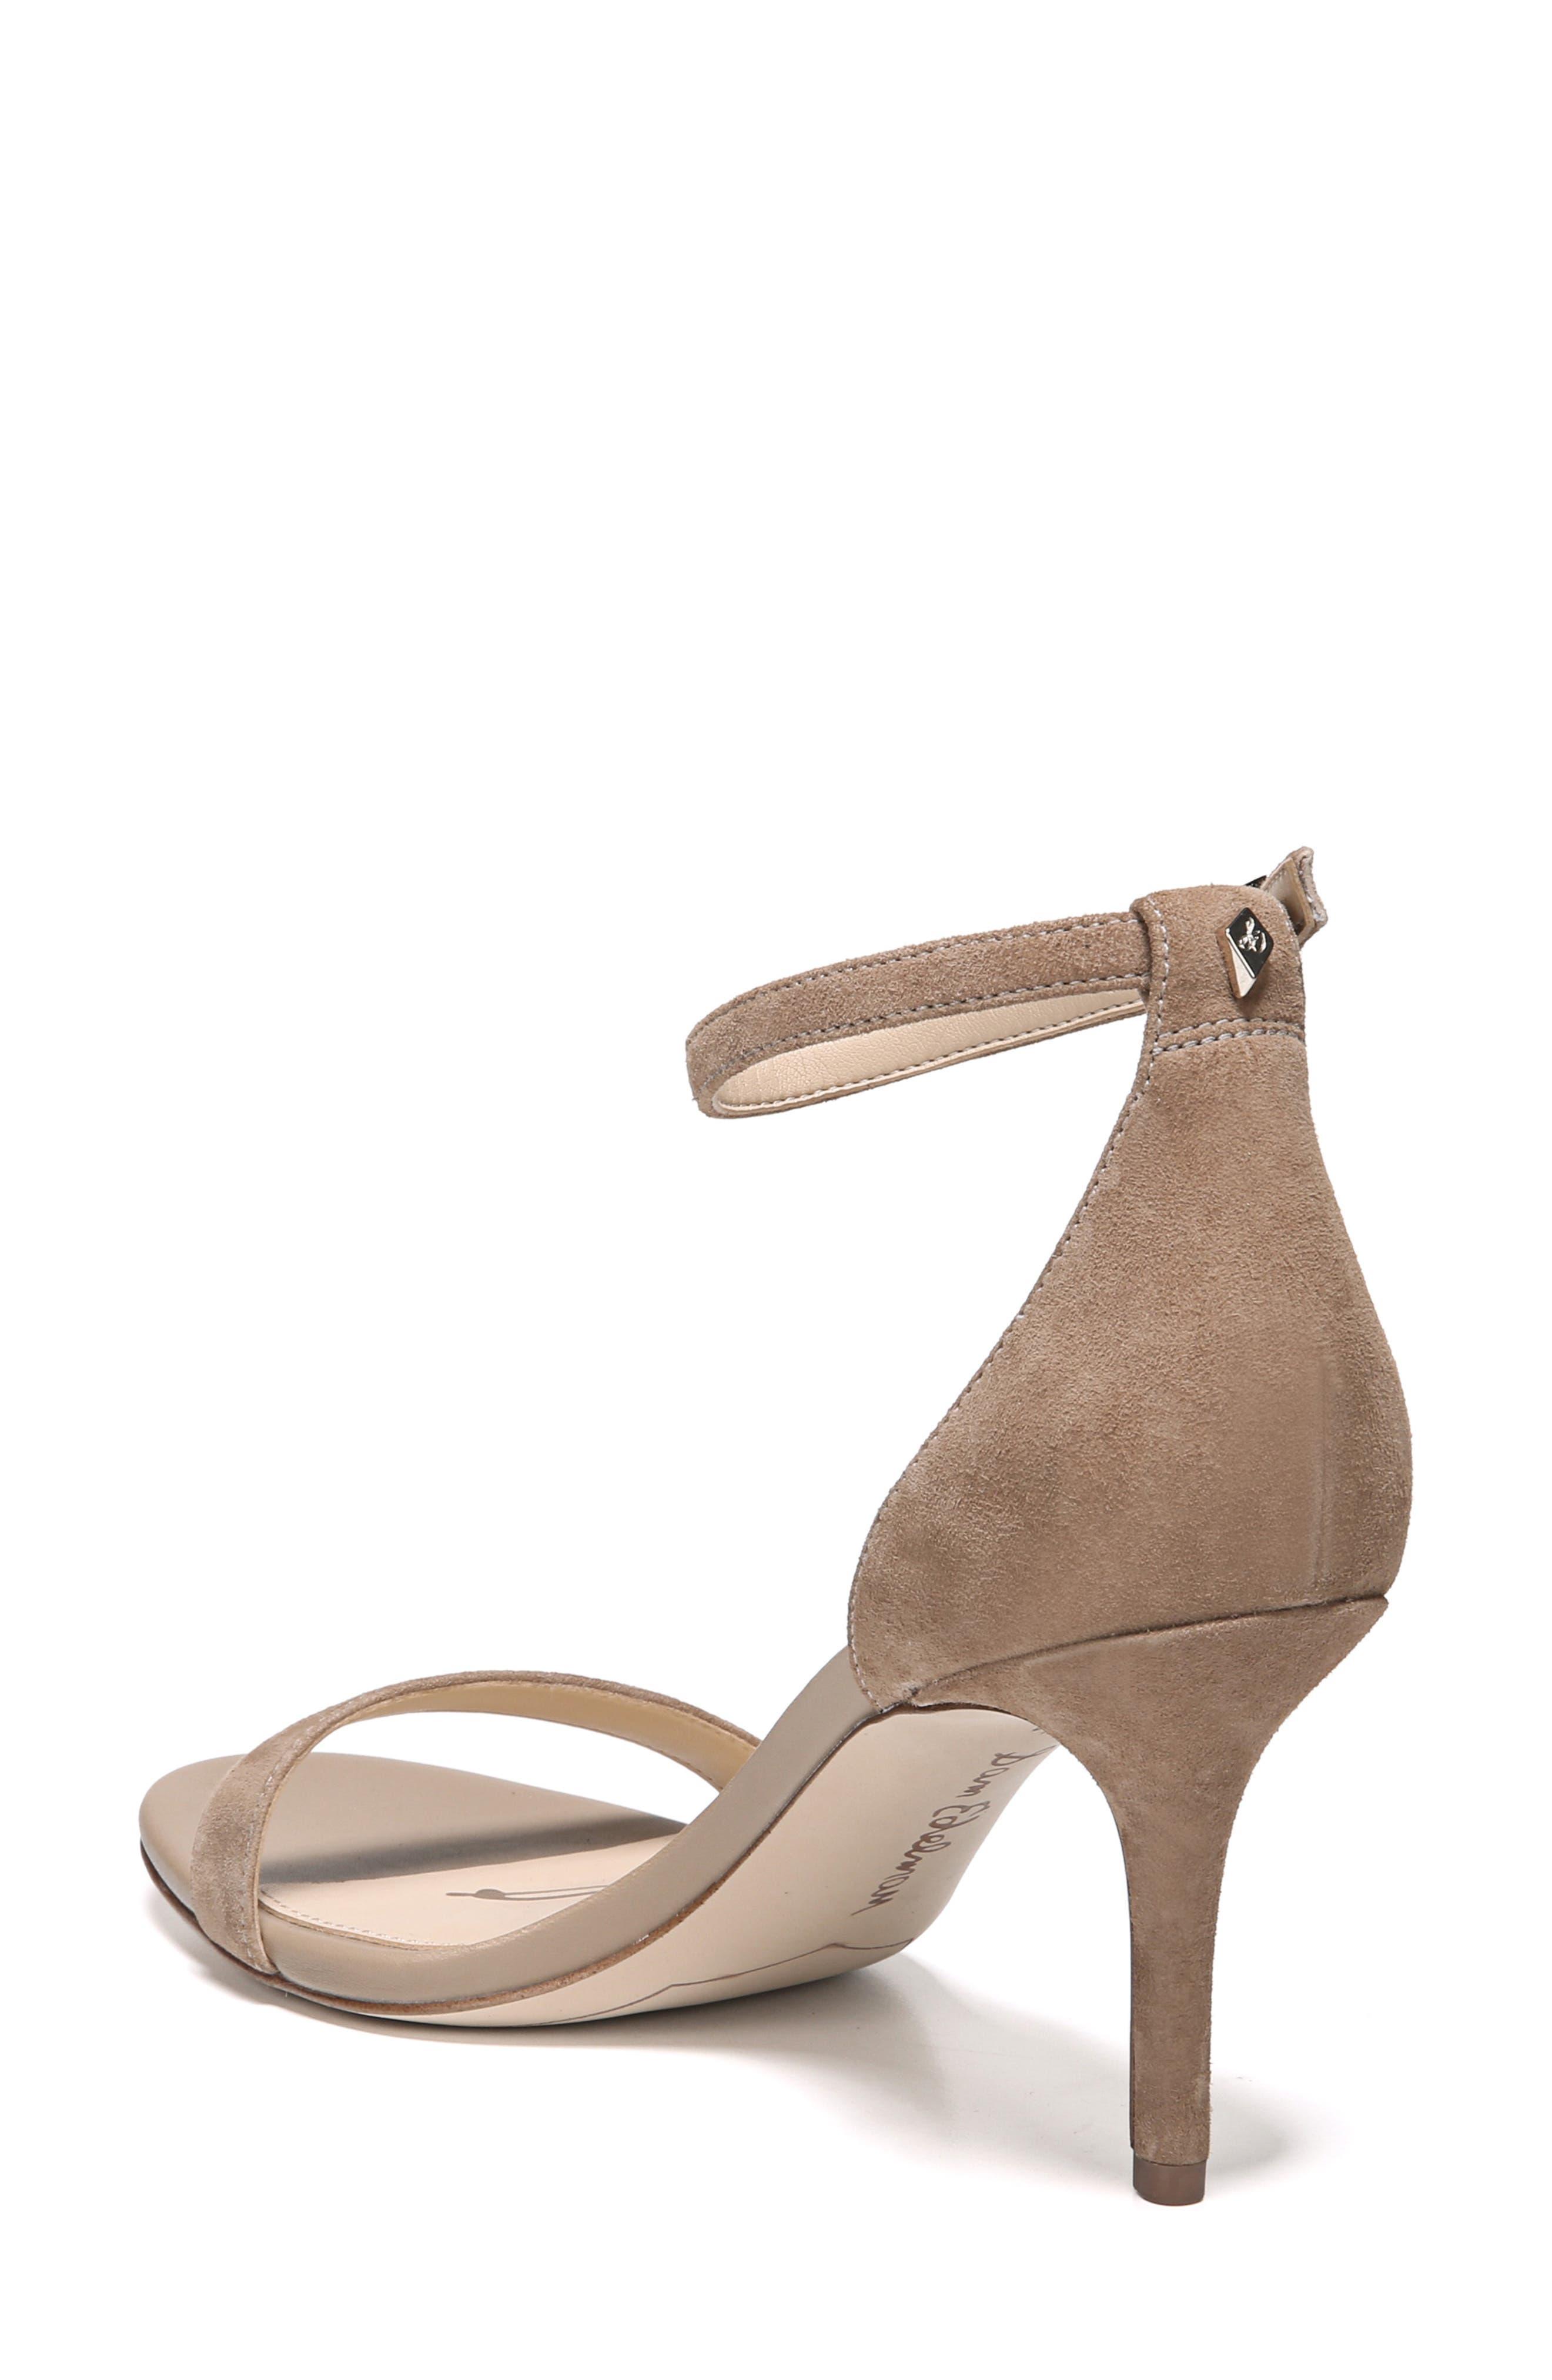 ,                             'Patti' Ankle Strap Sandal,                             Alternate thumbnail 89, color,                             254